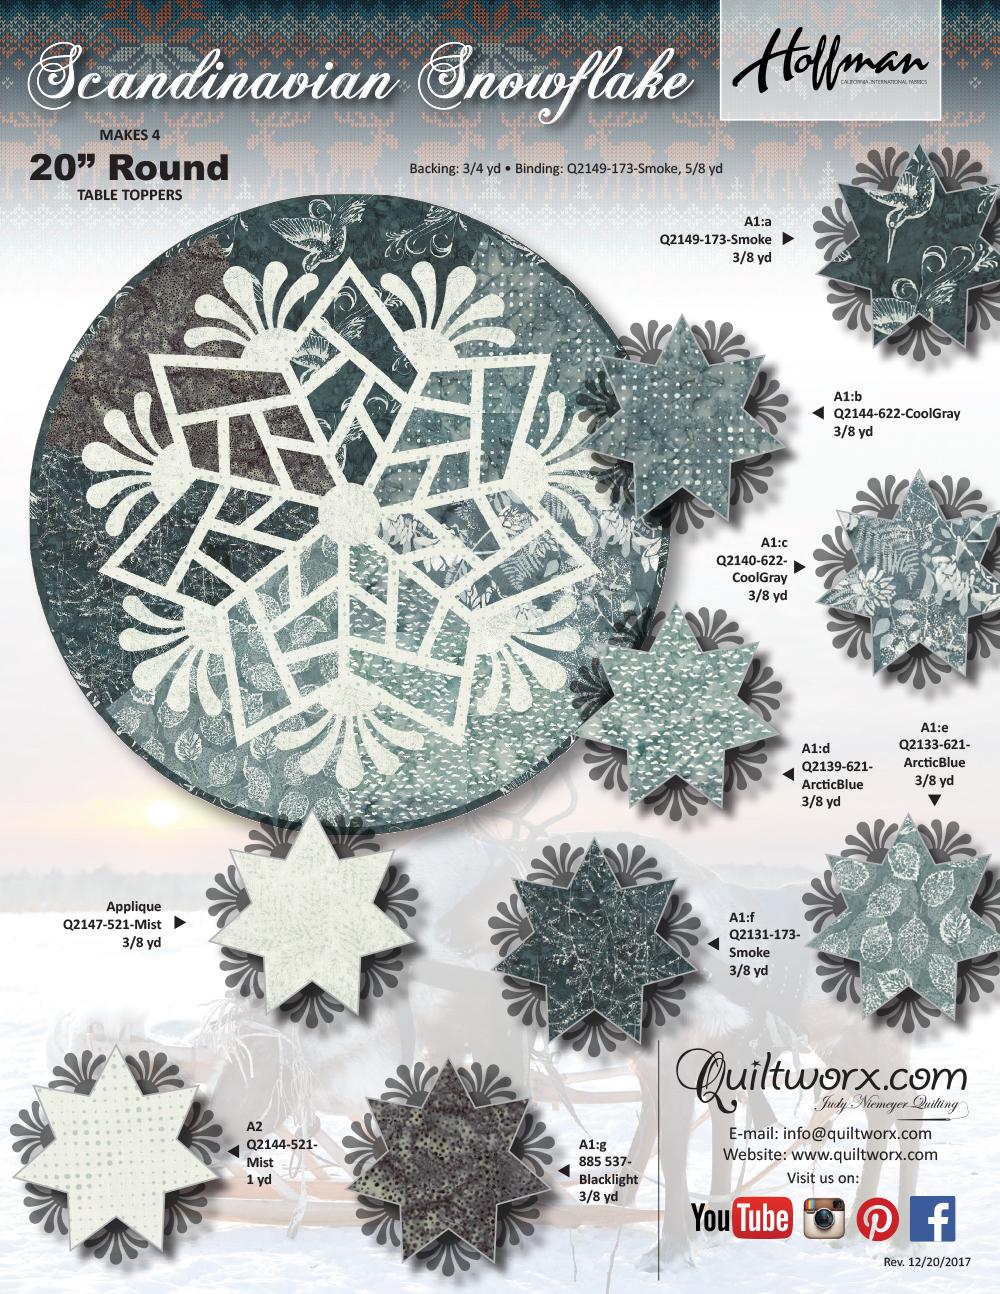 Scandinavian-Snowflake-(Grey)-Hoffman-1pg-KS